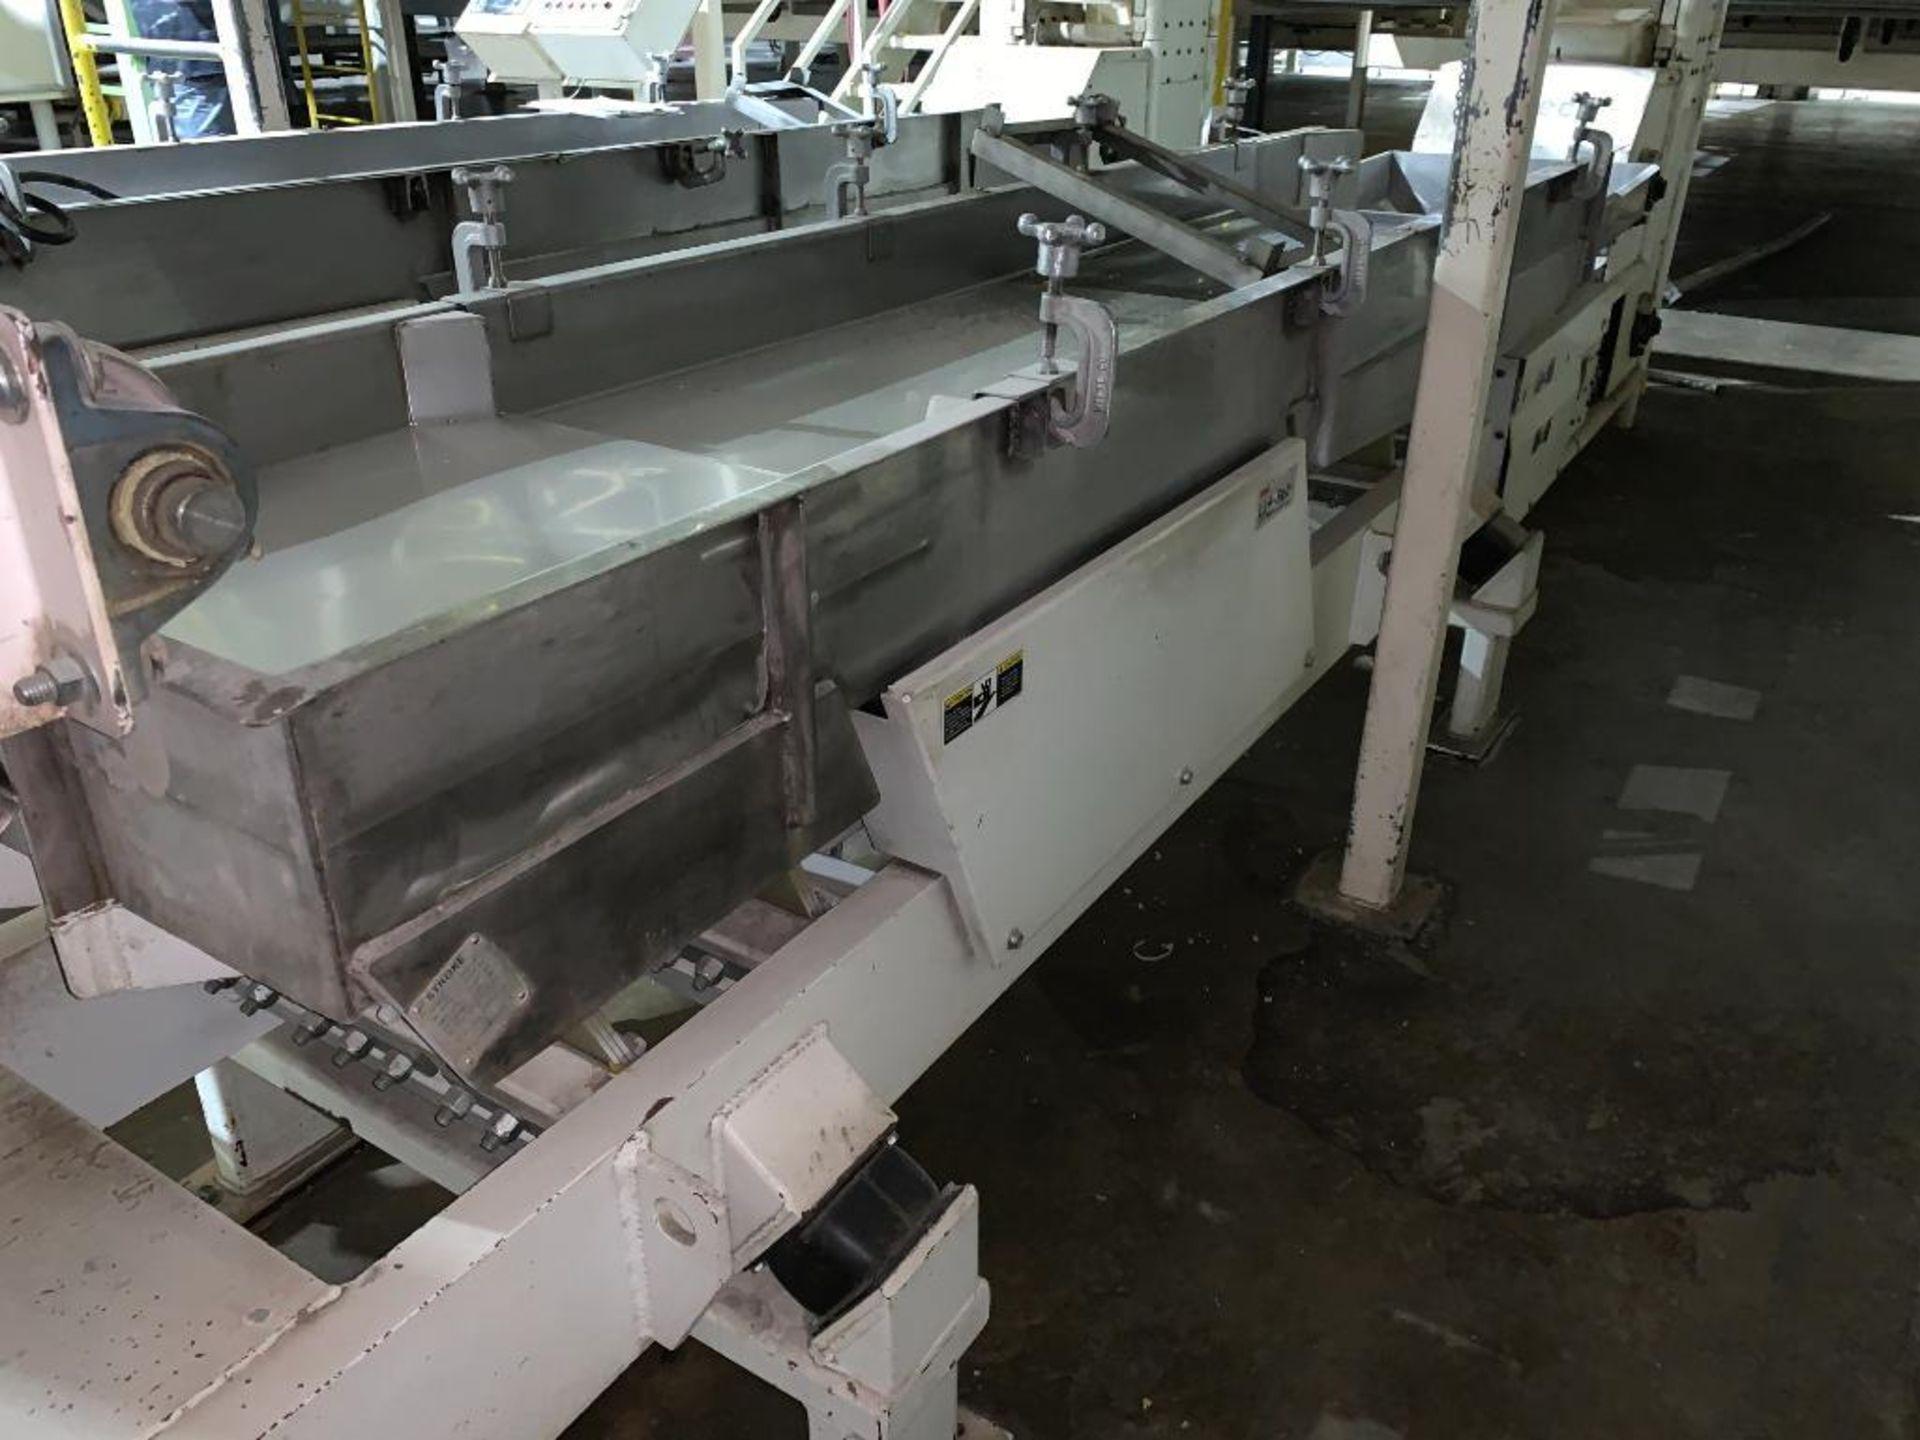 1993 Link-Belt stainless steel vibratory scalping conveyor